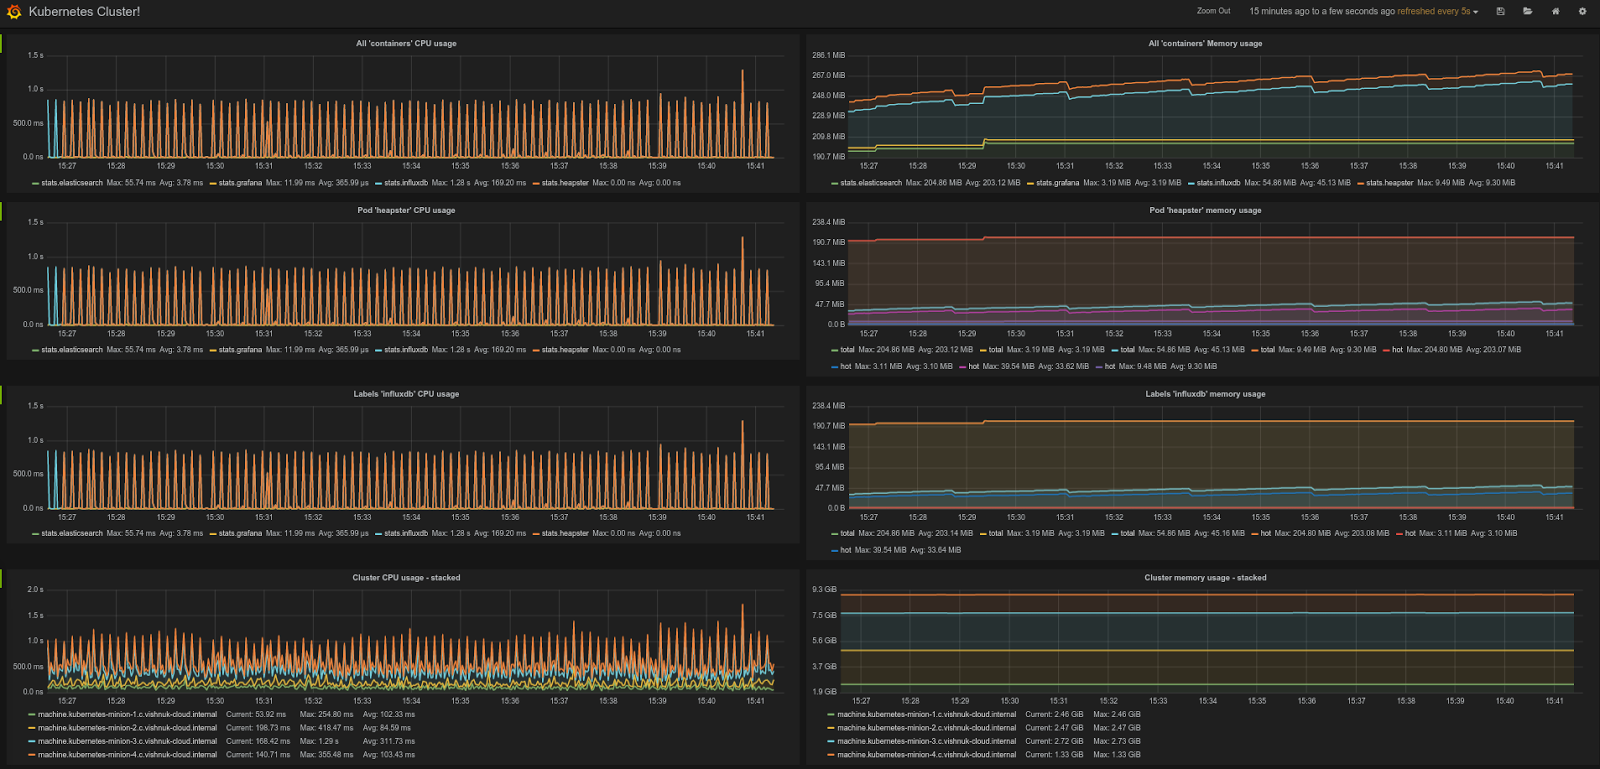 snapshot of the default Kubernetes Grafana dashboard